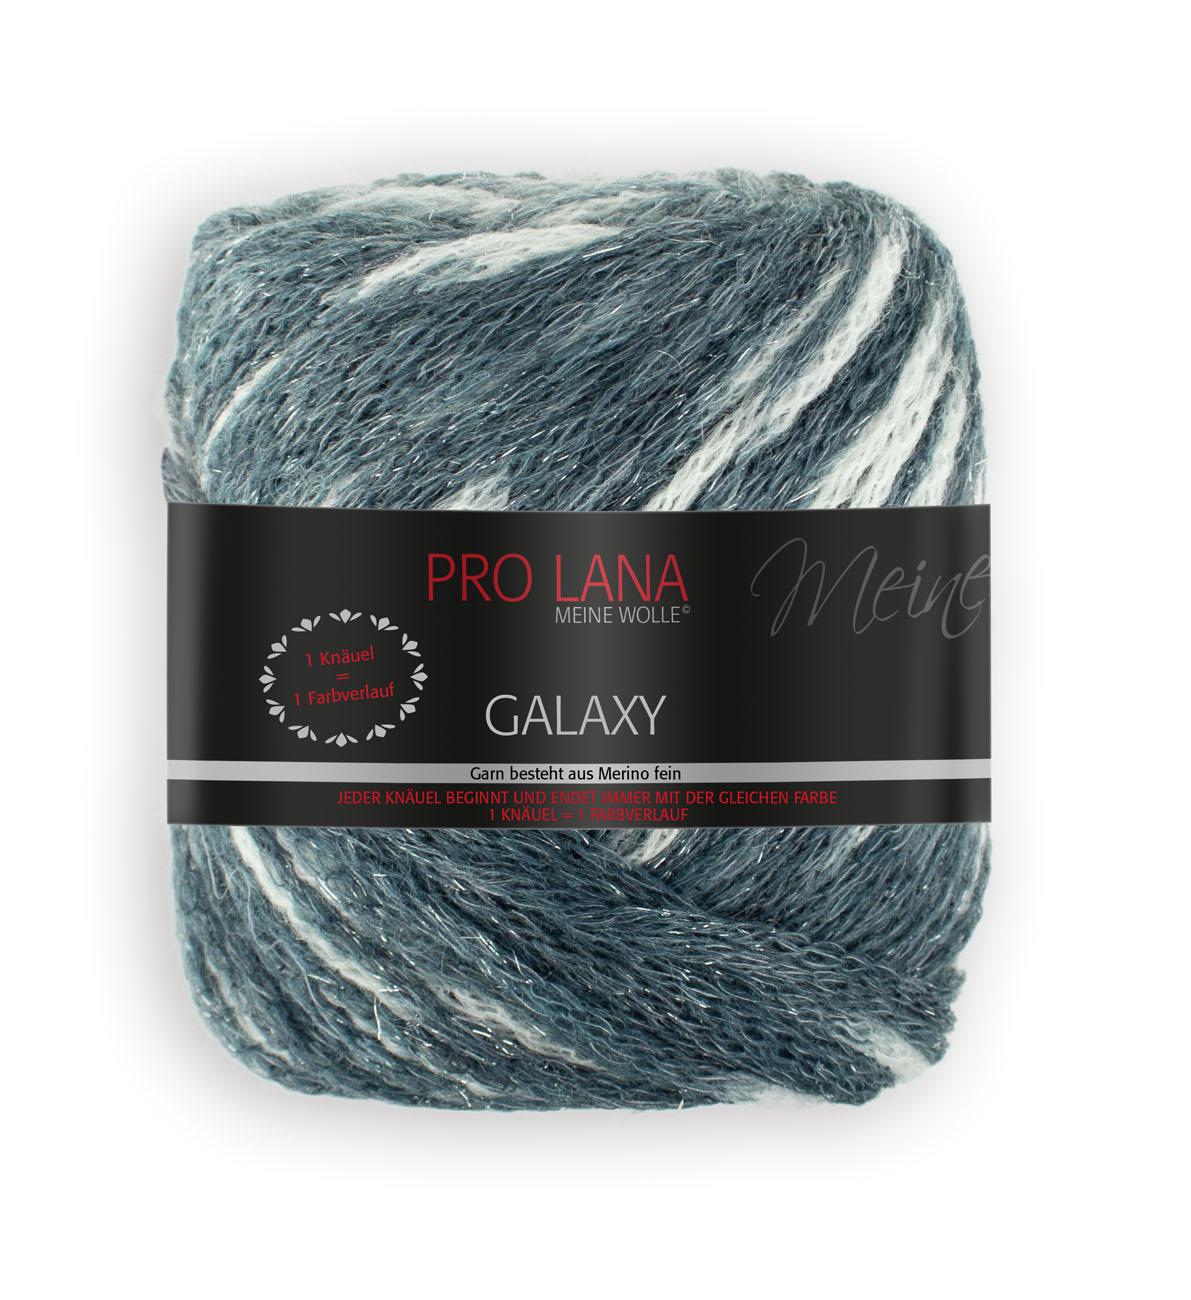 Pro Lana Galaxy 100g   0,5kg